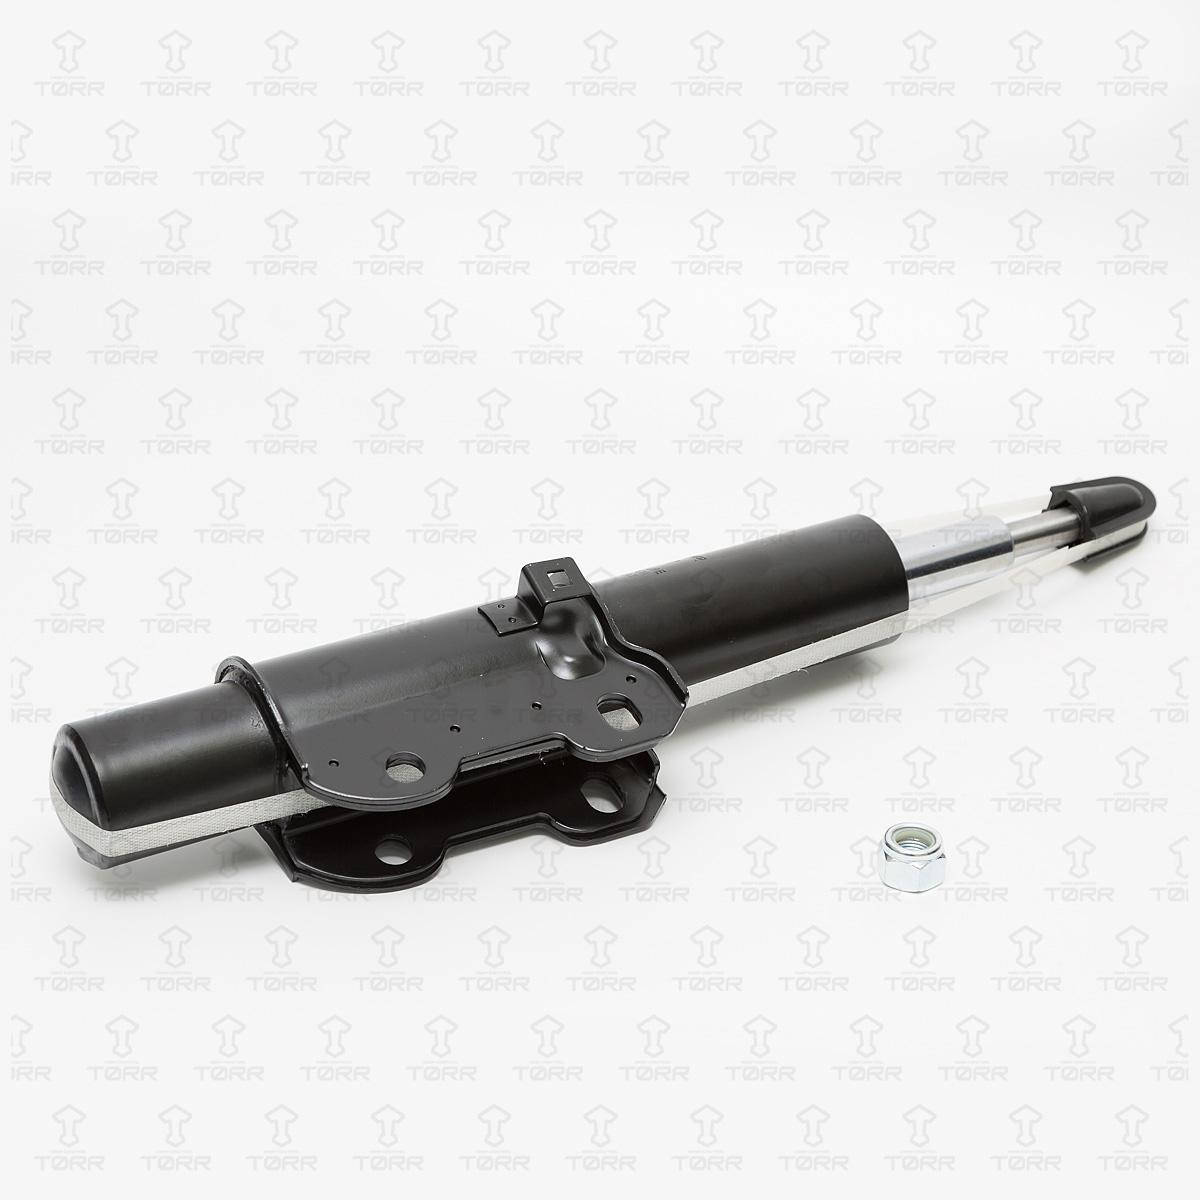 Амортизатор передний 906 209CDI-318CDI Sprinter/Crafter